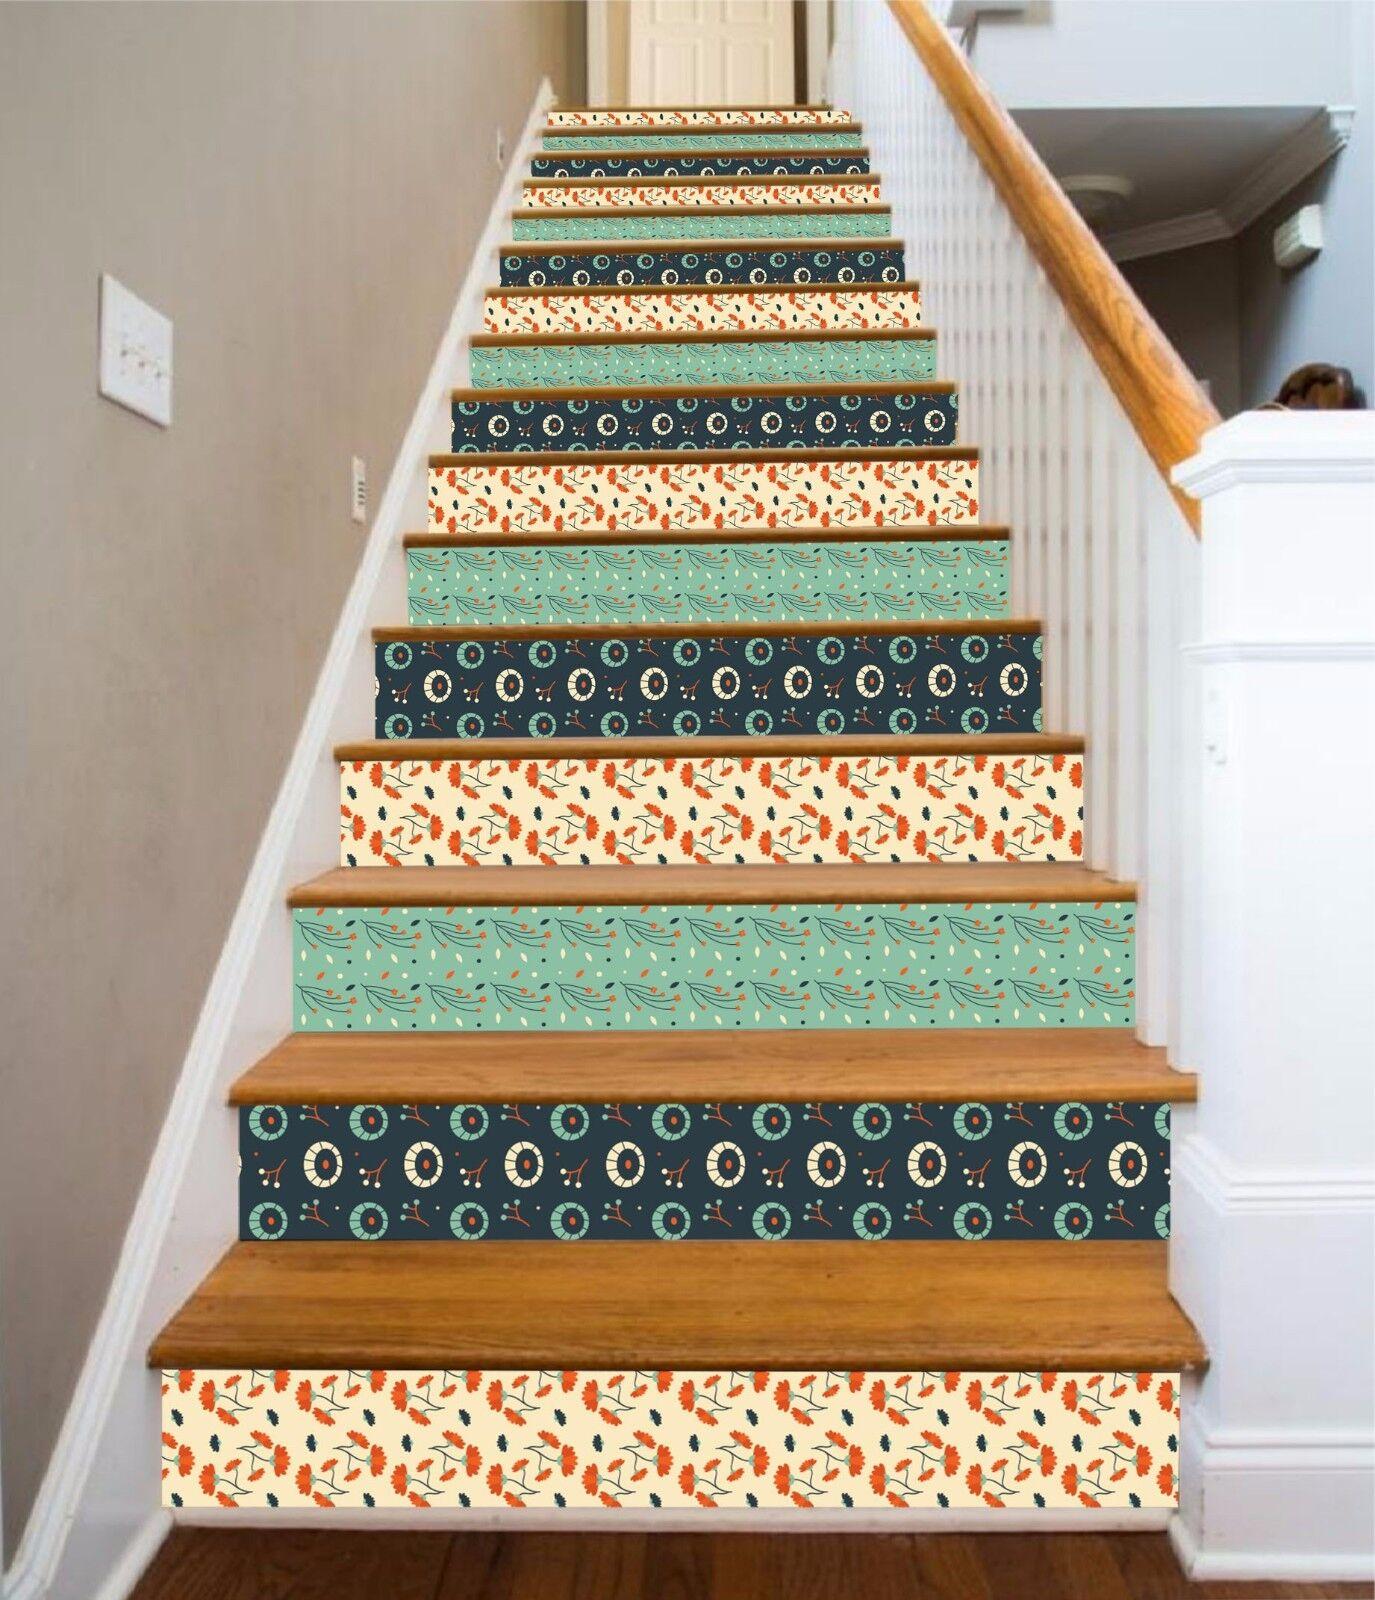 3D Florale Muster 1 Stair Risers Dekoration Fototapete Vinyl Aufkleber Tapete DE